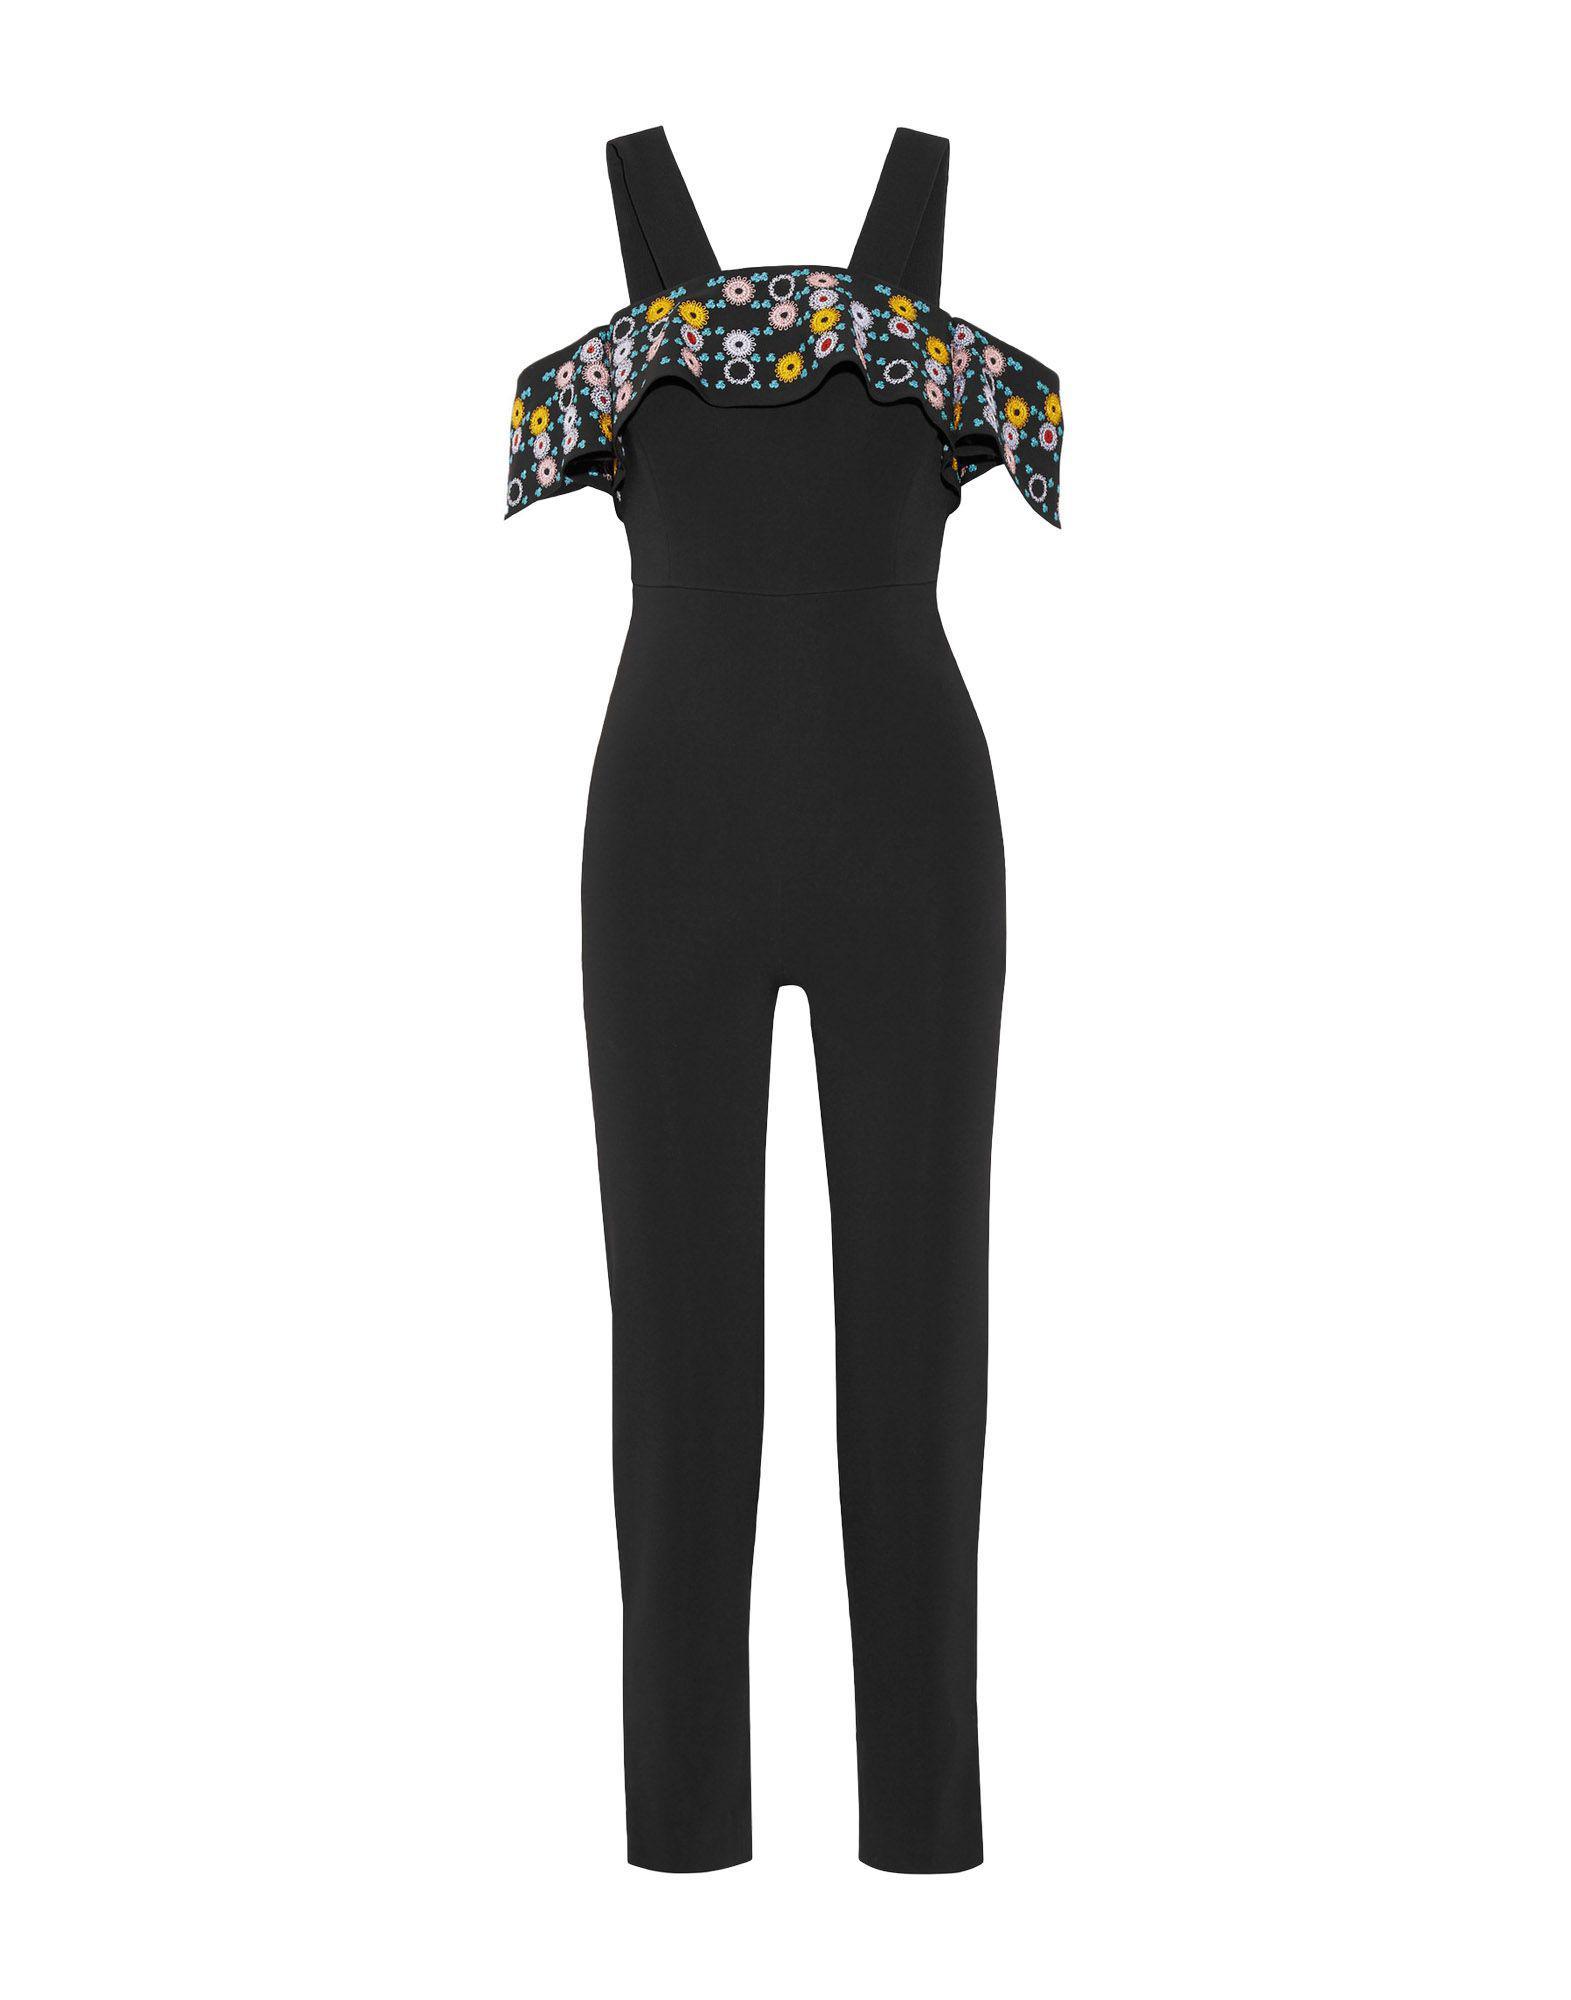 dba37d3ce105 Peter Pilotto Jumpsuit in Black - Save 77% - Lyst